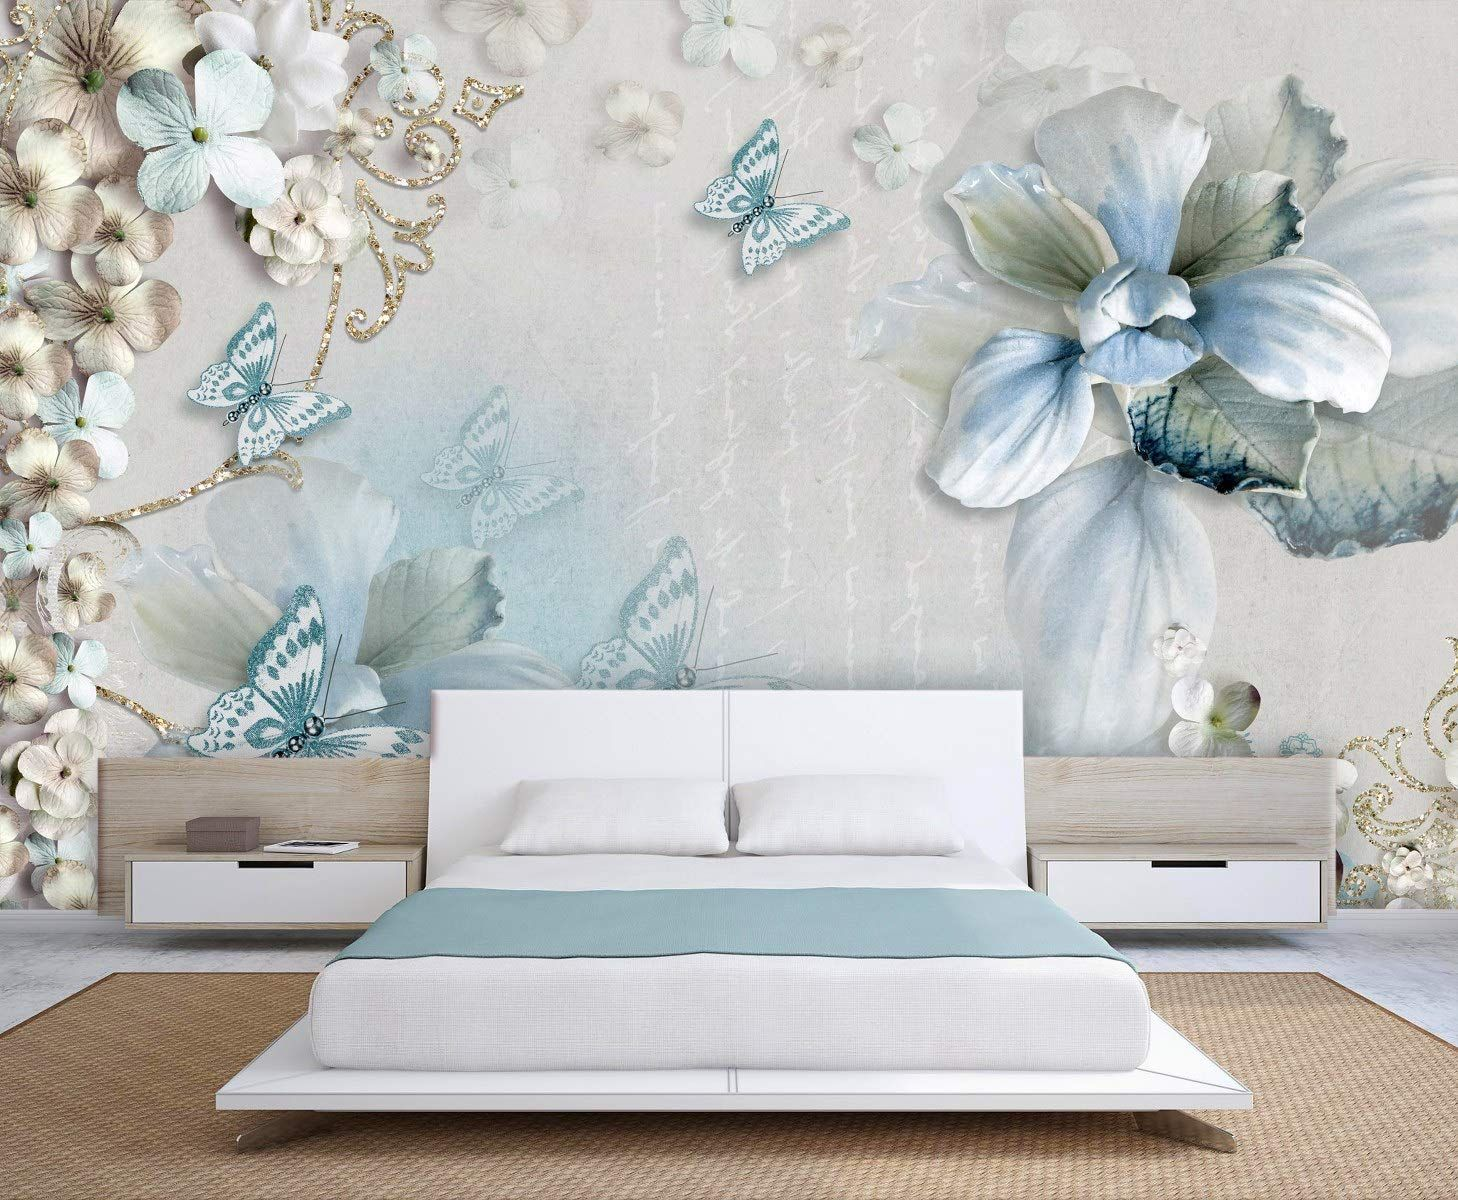 3d White And Brown Flowers And Blue Butterflies Wallpaper Design Living Room Wallpaper 3d Wallpaper Designs For Living Room Wallpaper Decor